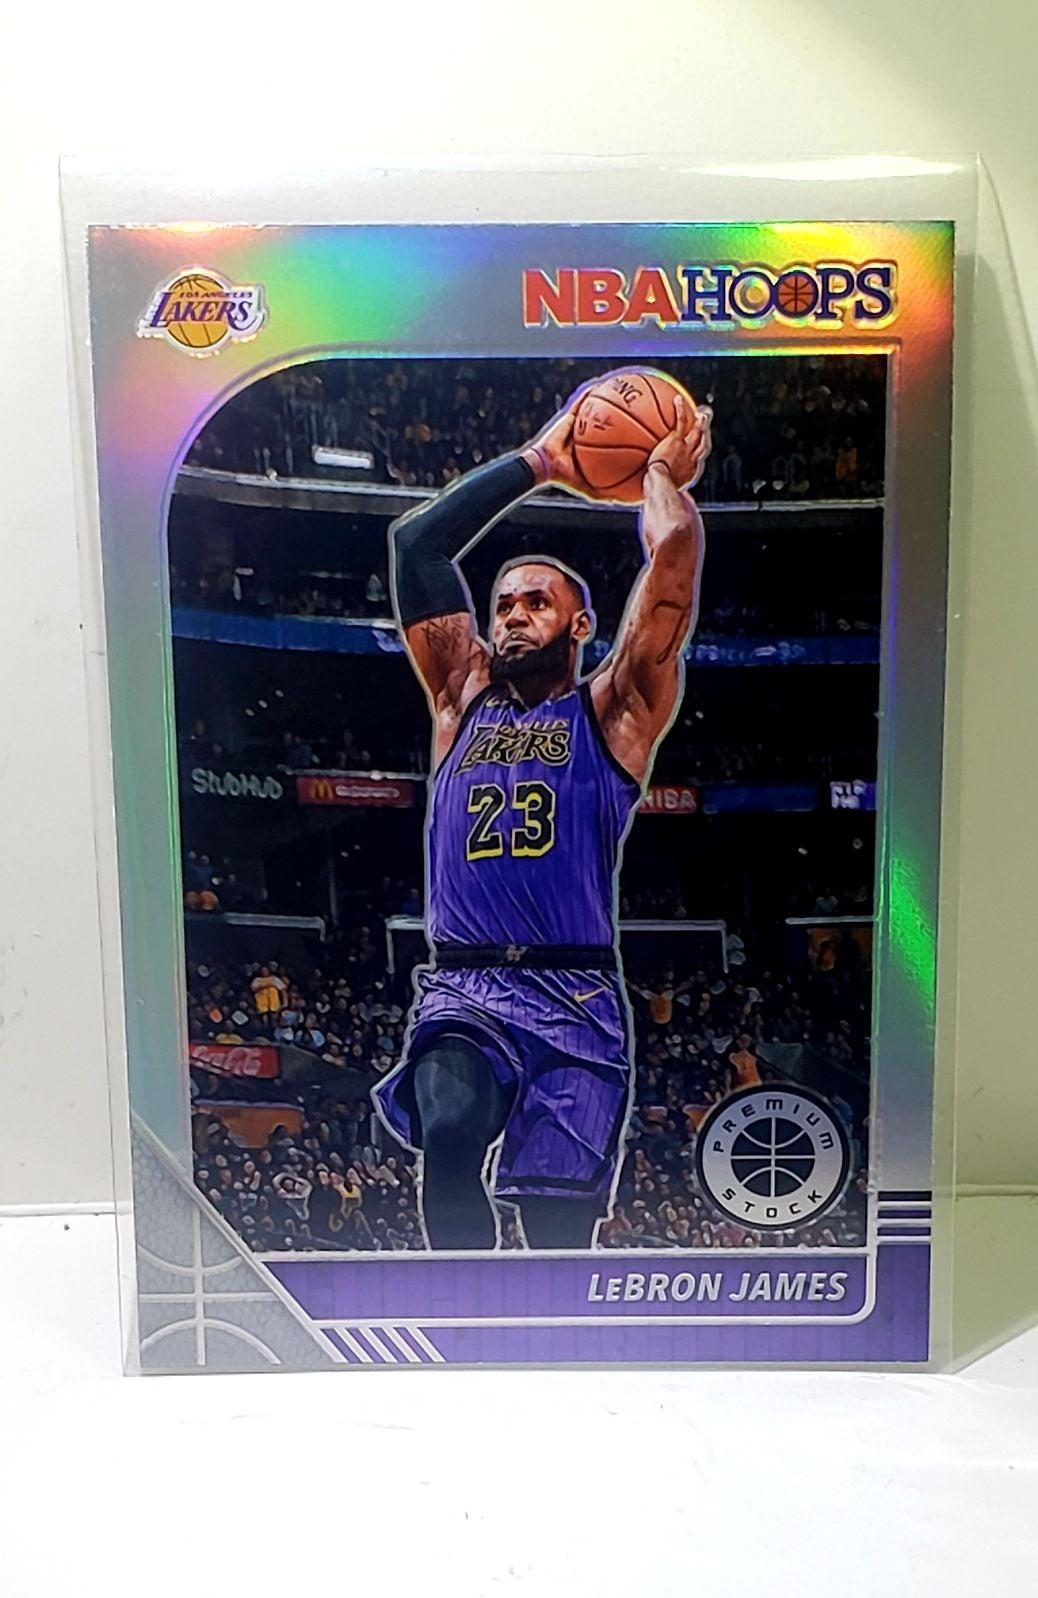 LeBron James Premium Hoops Prizm